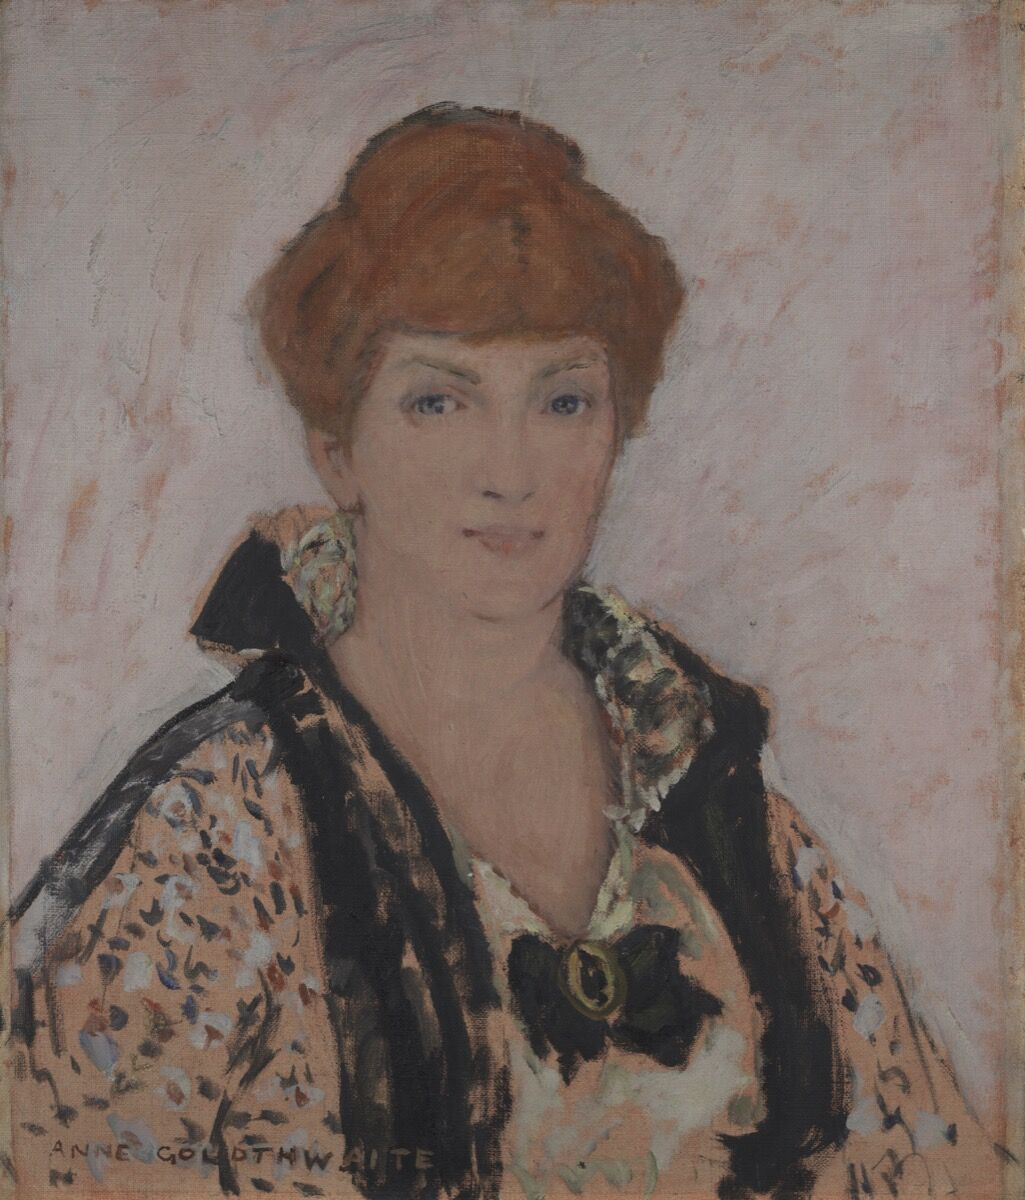 Anne Goldthwaite, Portrait of Katherine Sophie Dreier, 1915-1916. Courtesy of Yale University Art Gallery